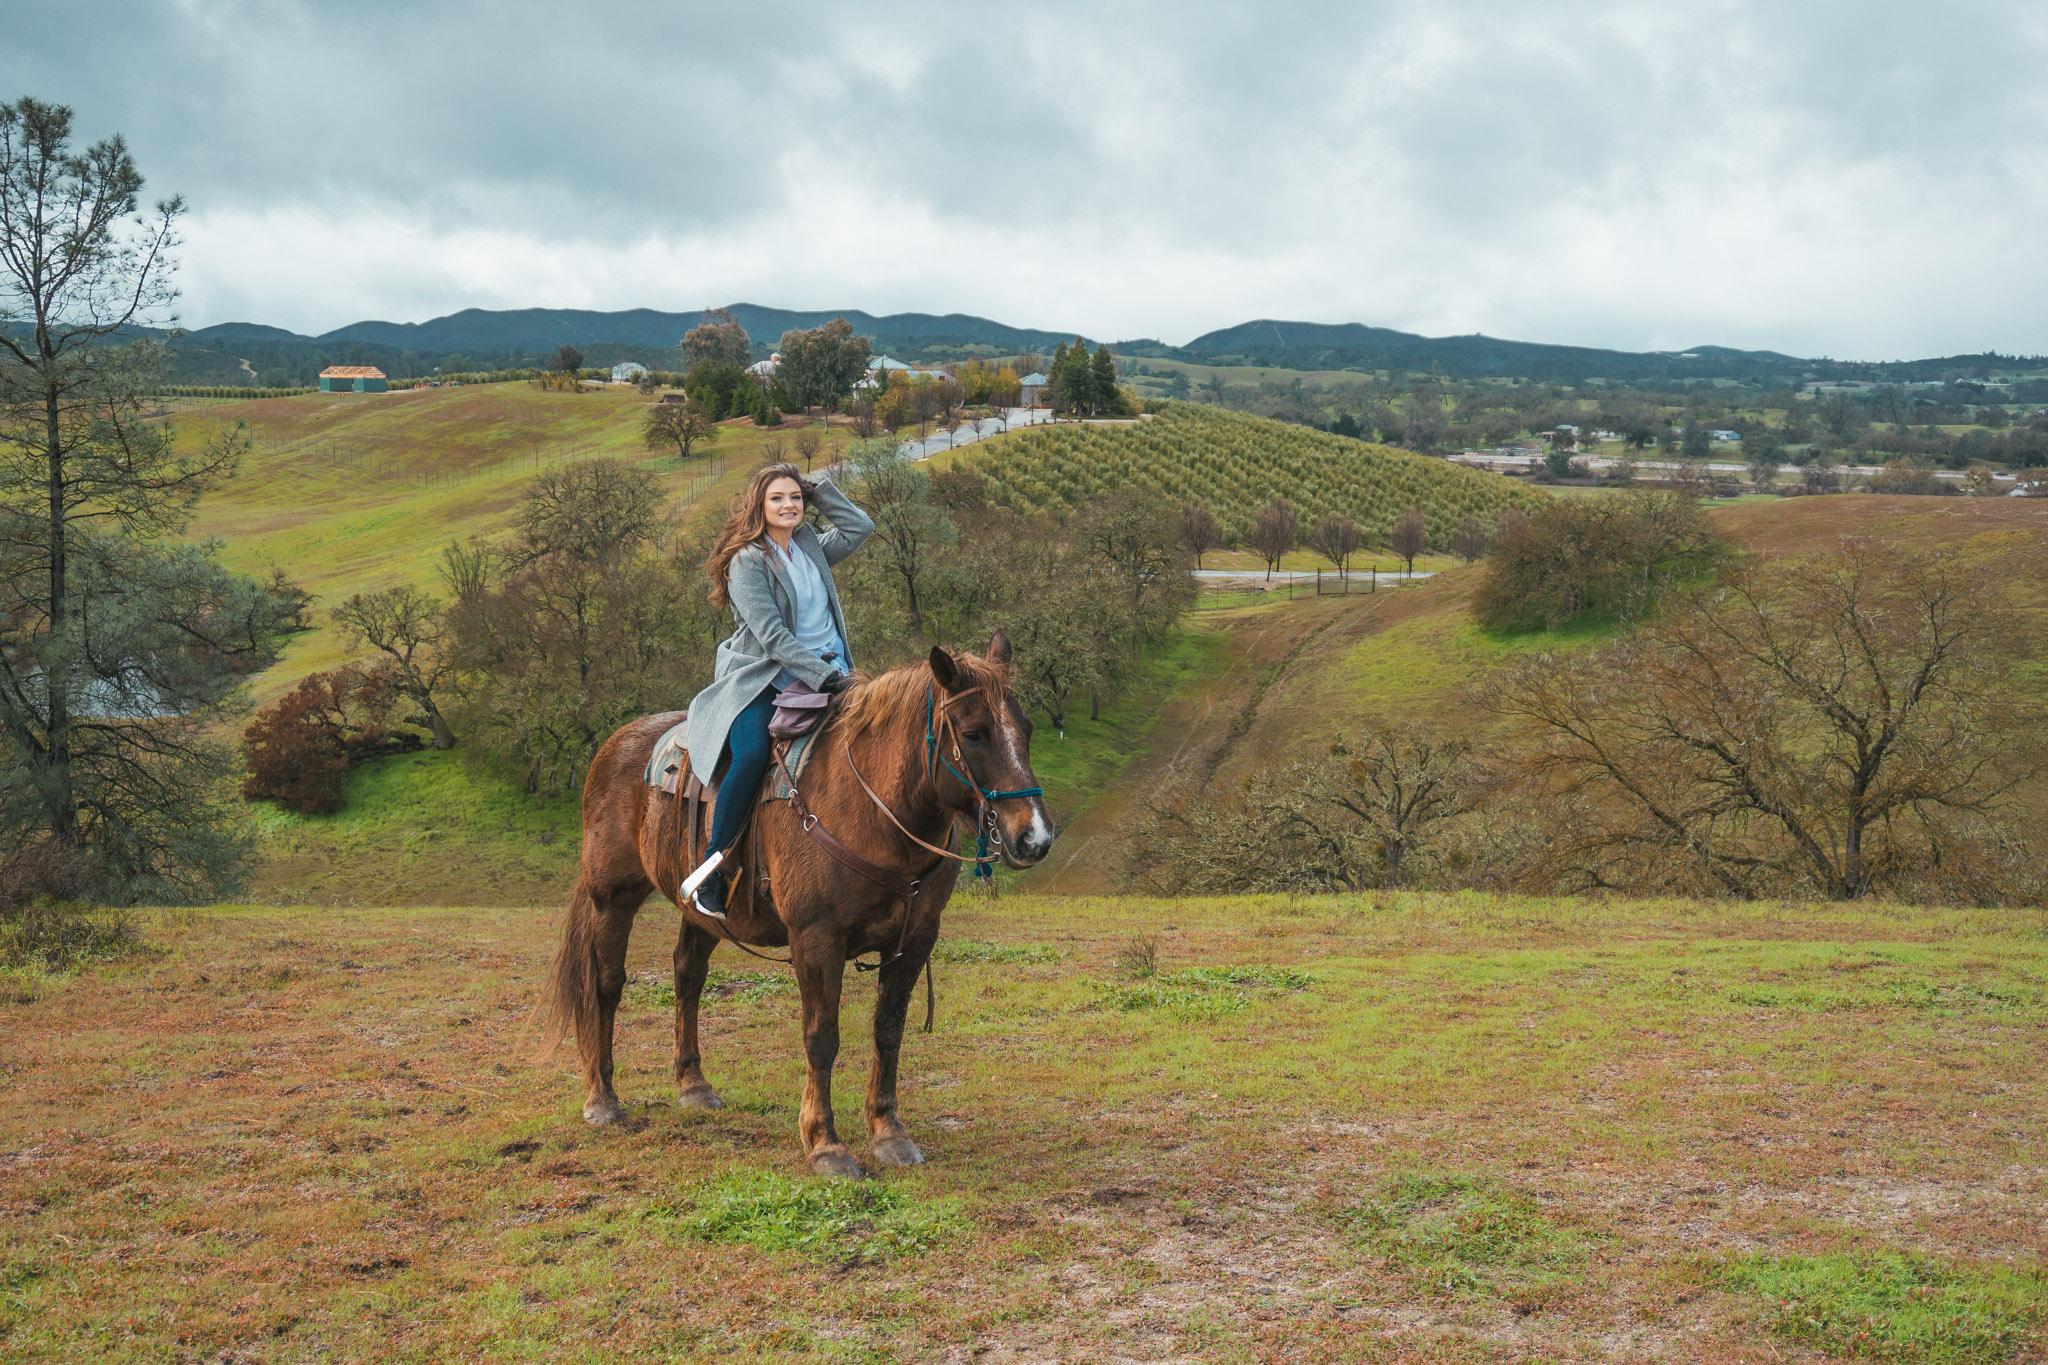 Horseback riding through a winery // 5 Adventurous Things to Do in San Luis Obispo County #readysetjetset #slocal #travel #blogpost #adventuretravel #california #westcoast